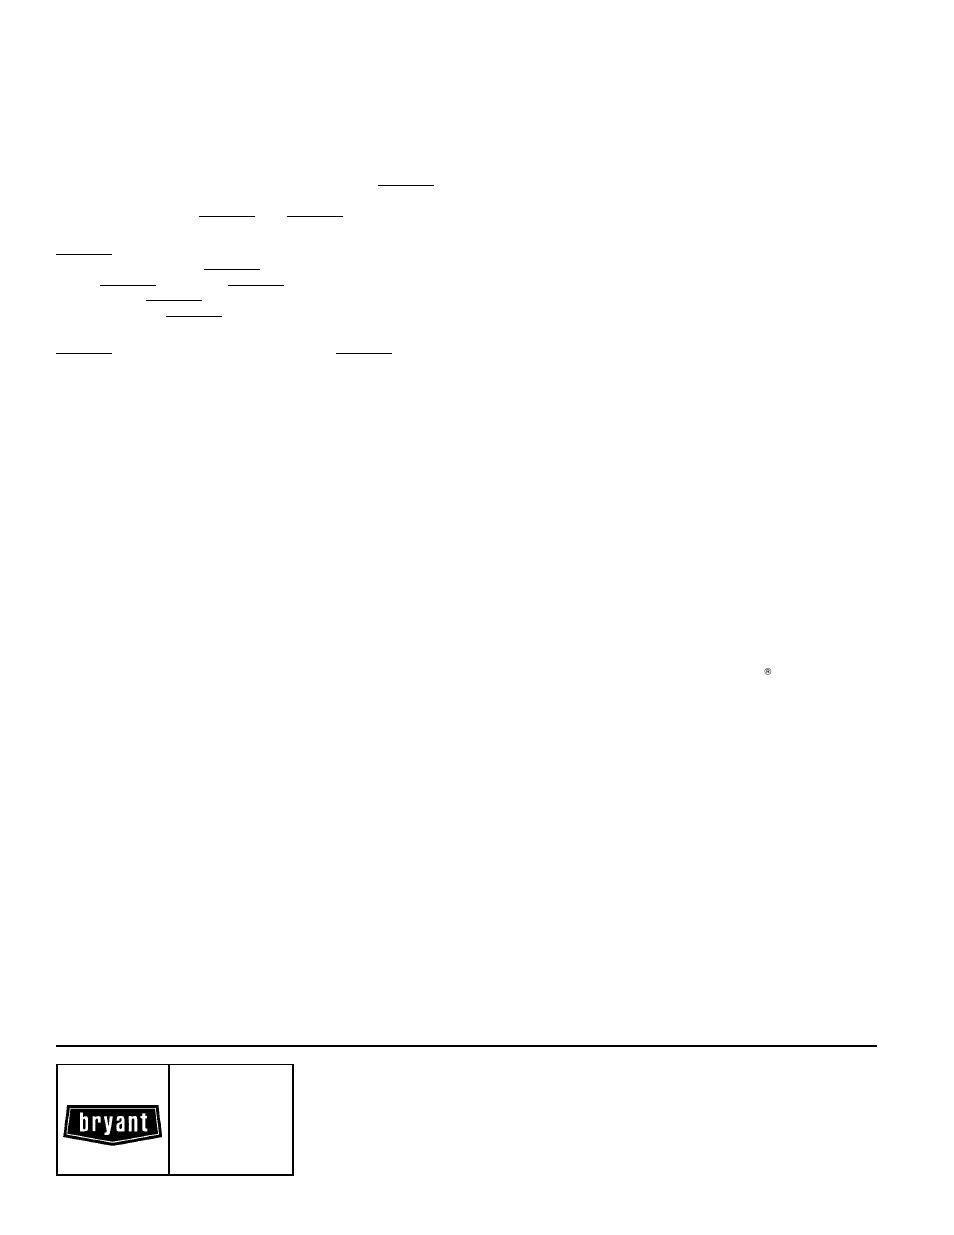 bryant bryant 579f user manual page 64 64 original mode rh manualsdir com bryant tstatbbprh01-b user manual bryant instruction manual